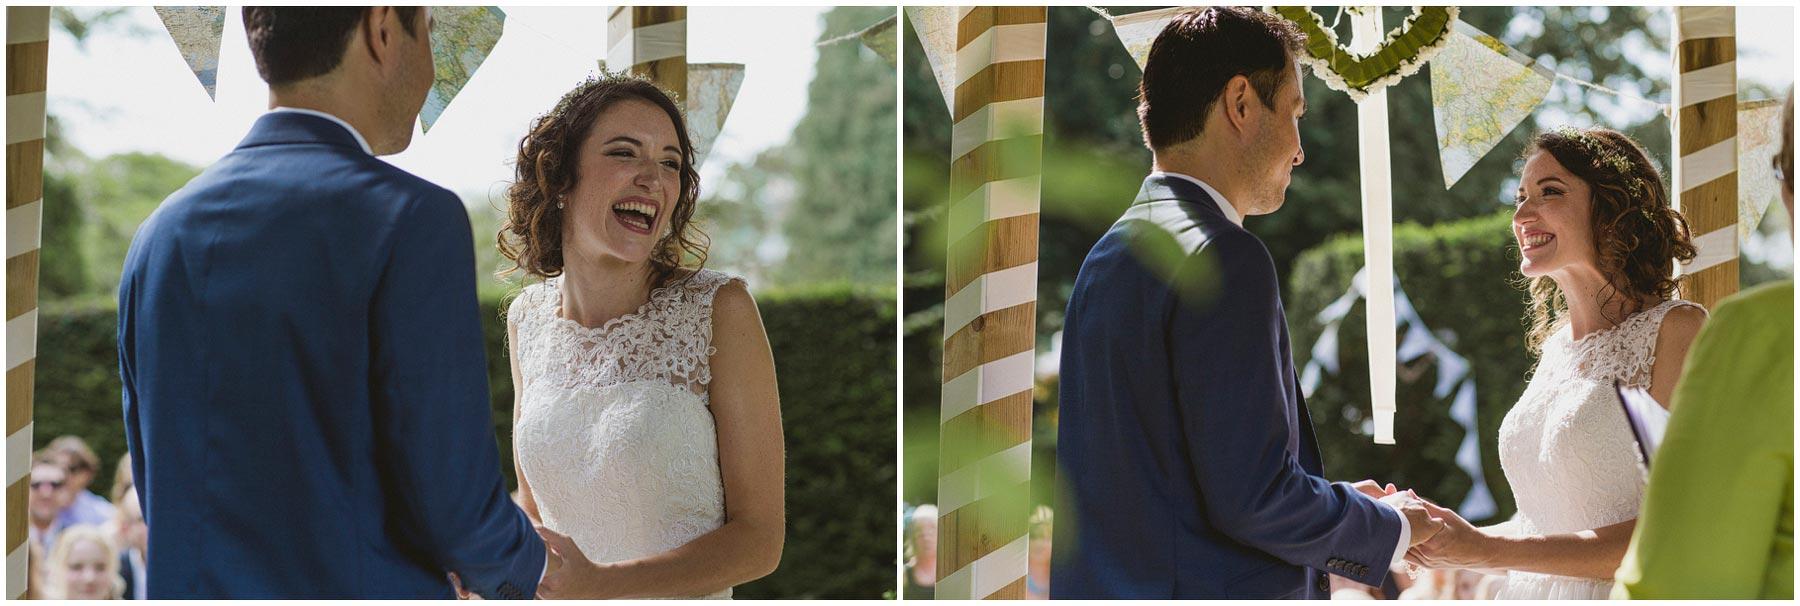 Colehayes-Park-Wedding-Photography_0088